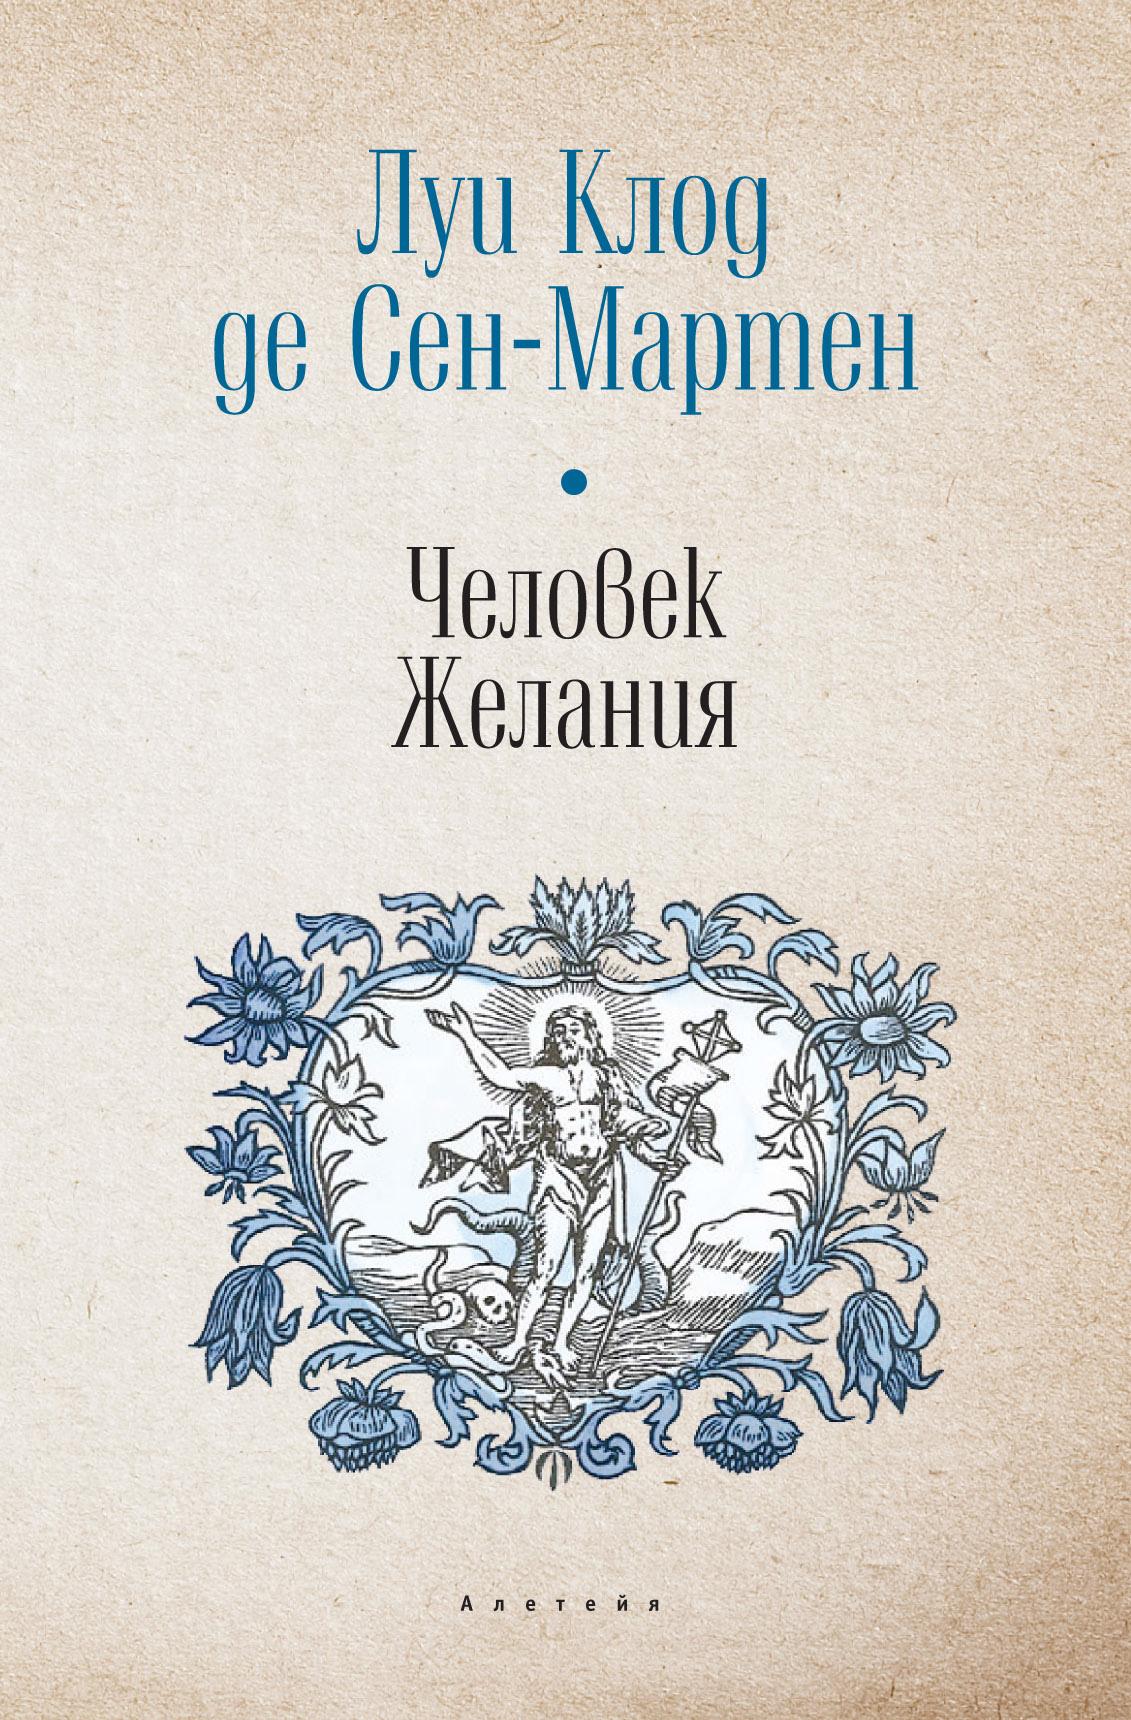 Луи Клод де Сен-Мартен Человек Желания арафель в цельзин д луи клод де сен мартен мартинизм неизвестного философа